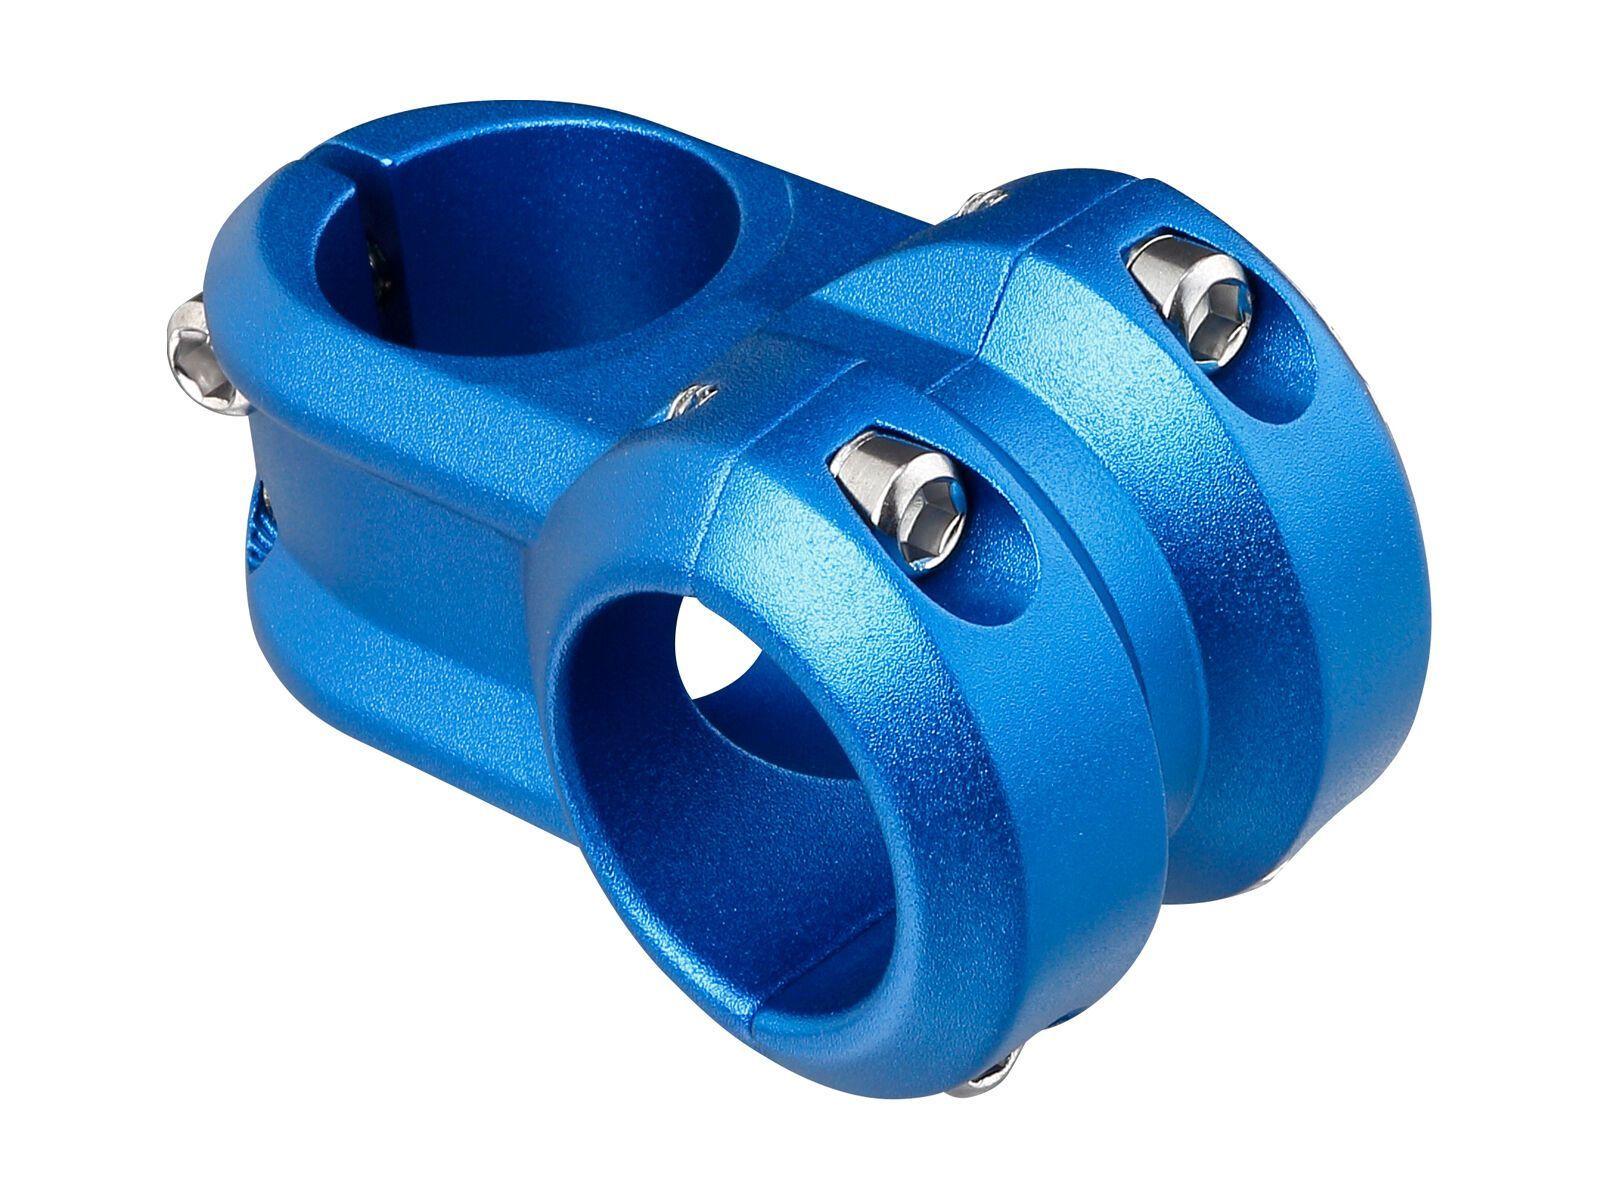 Spank Spoon 2 Stem blue 40 mm SP-STM-0091/21/40